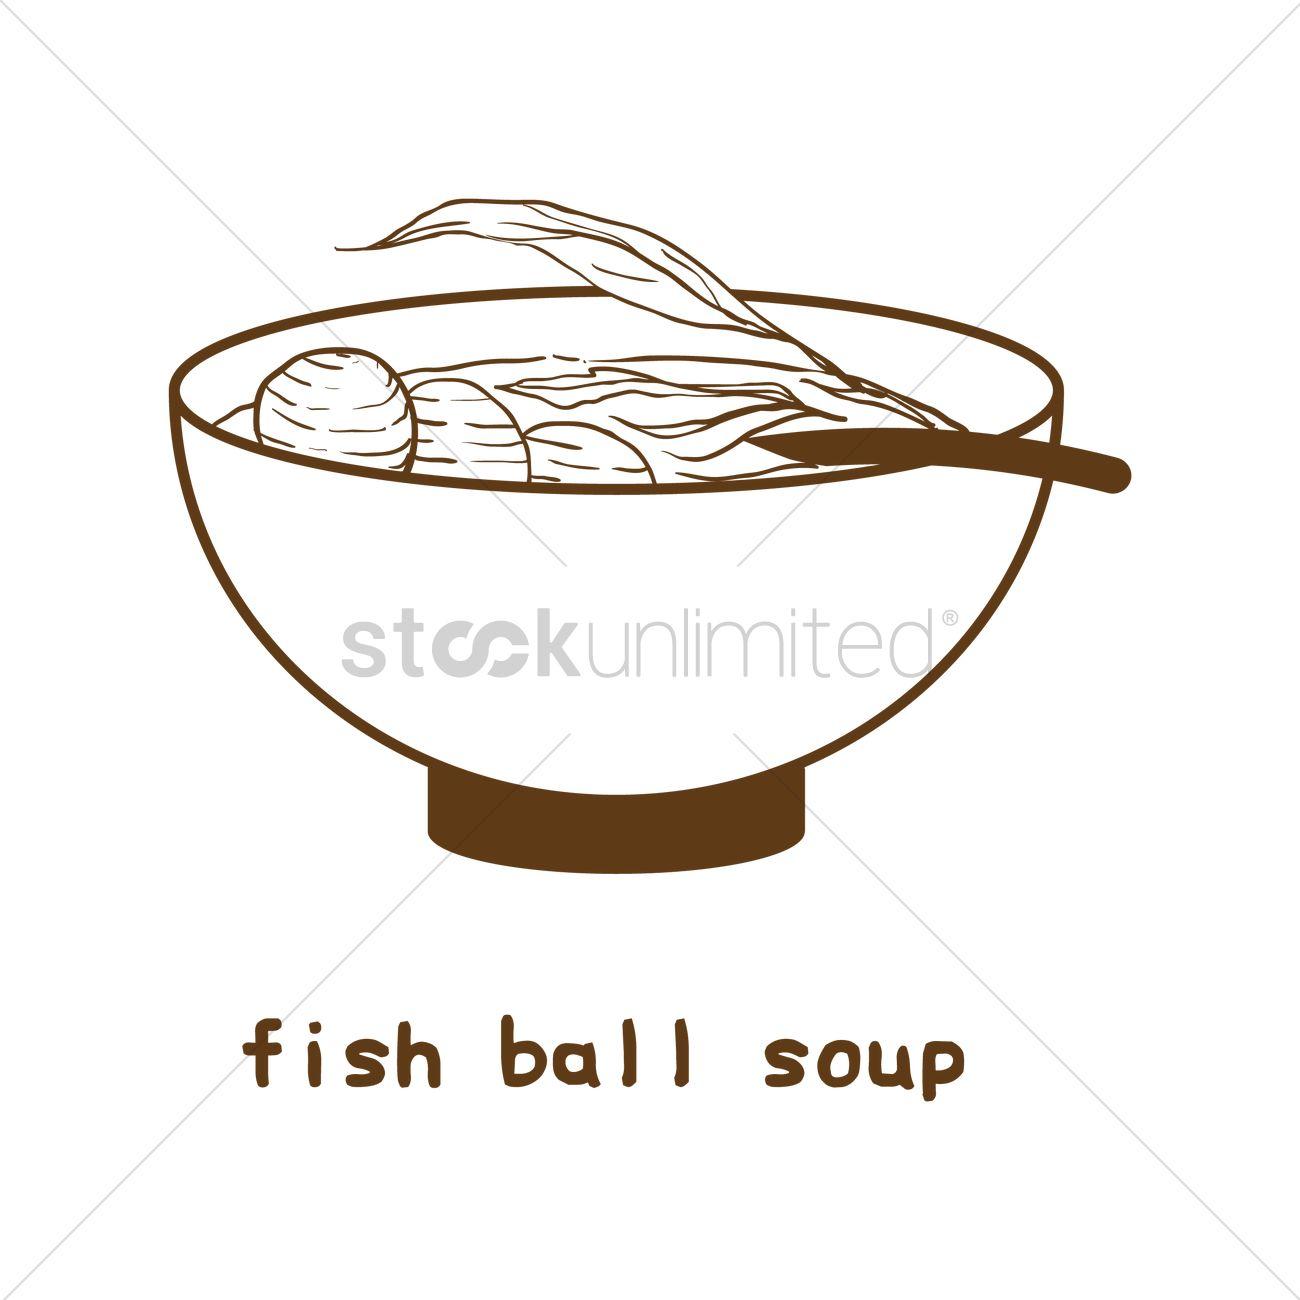 1300x1300 Fish Ball Soup Vector Image